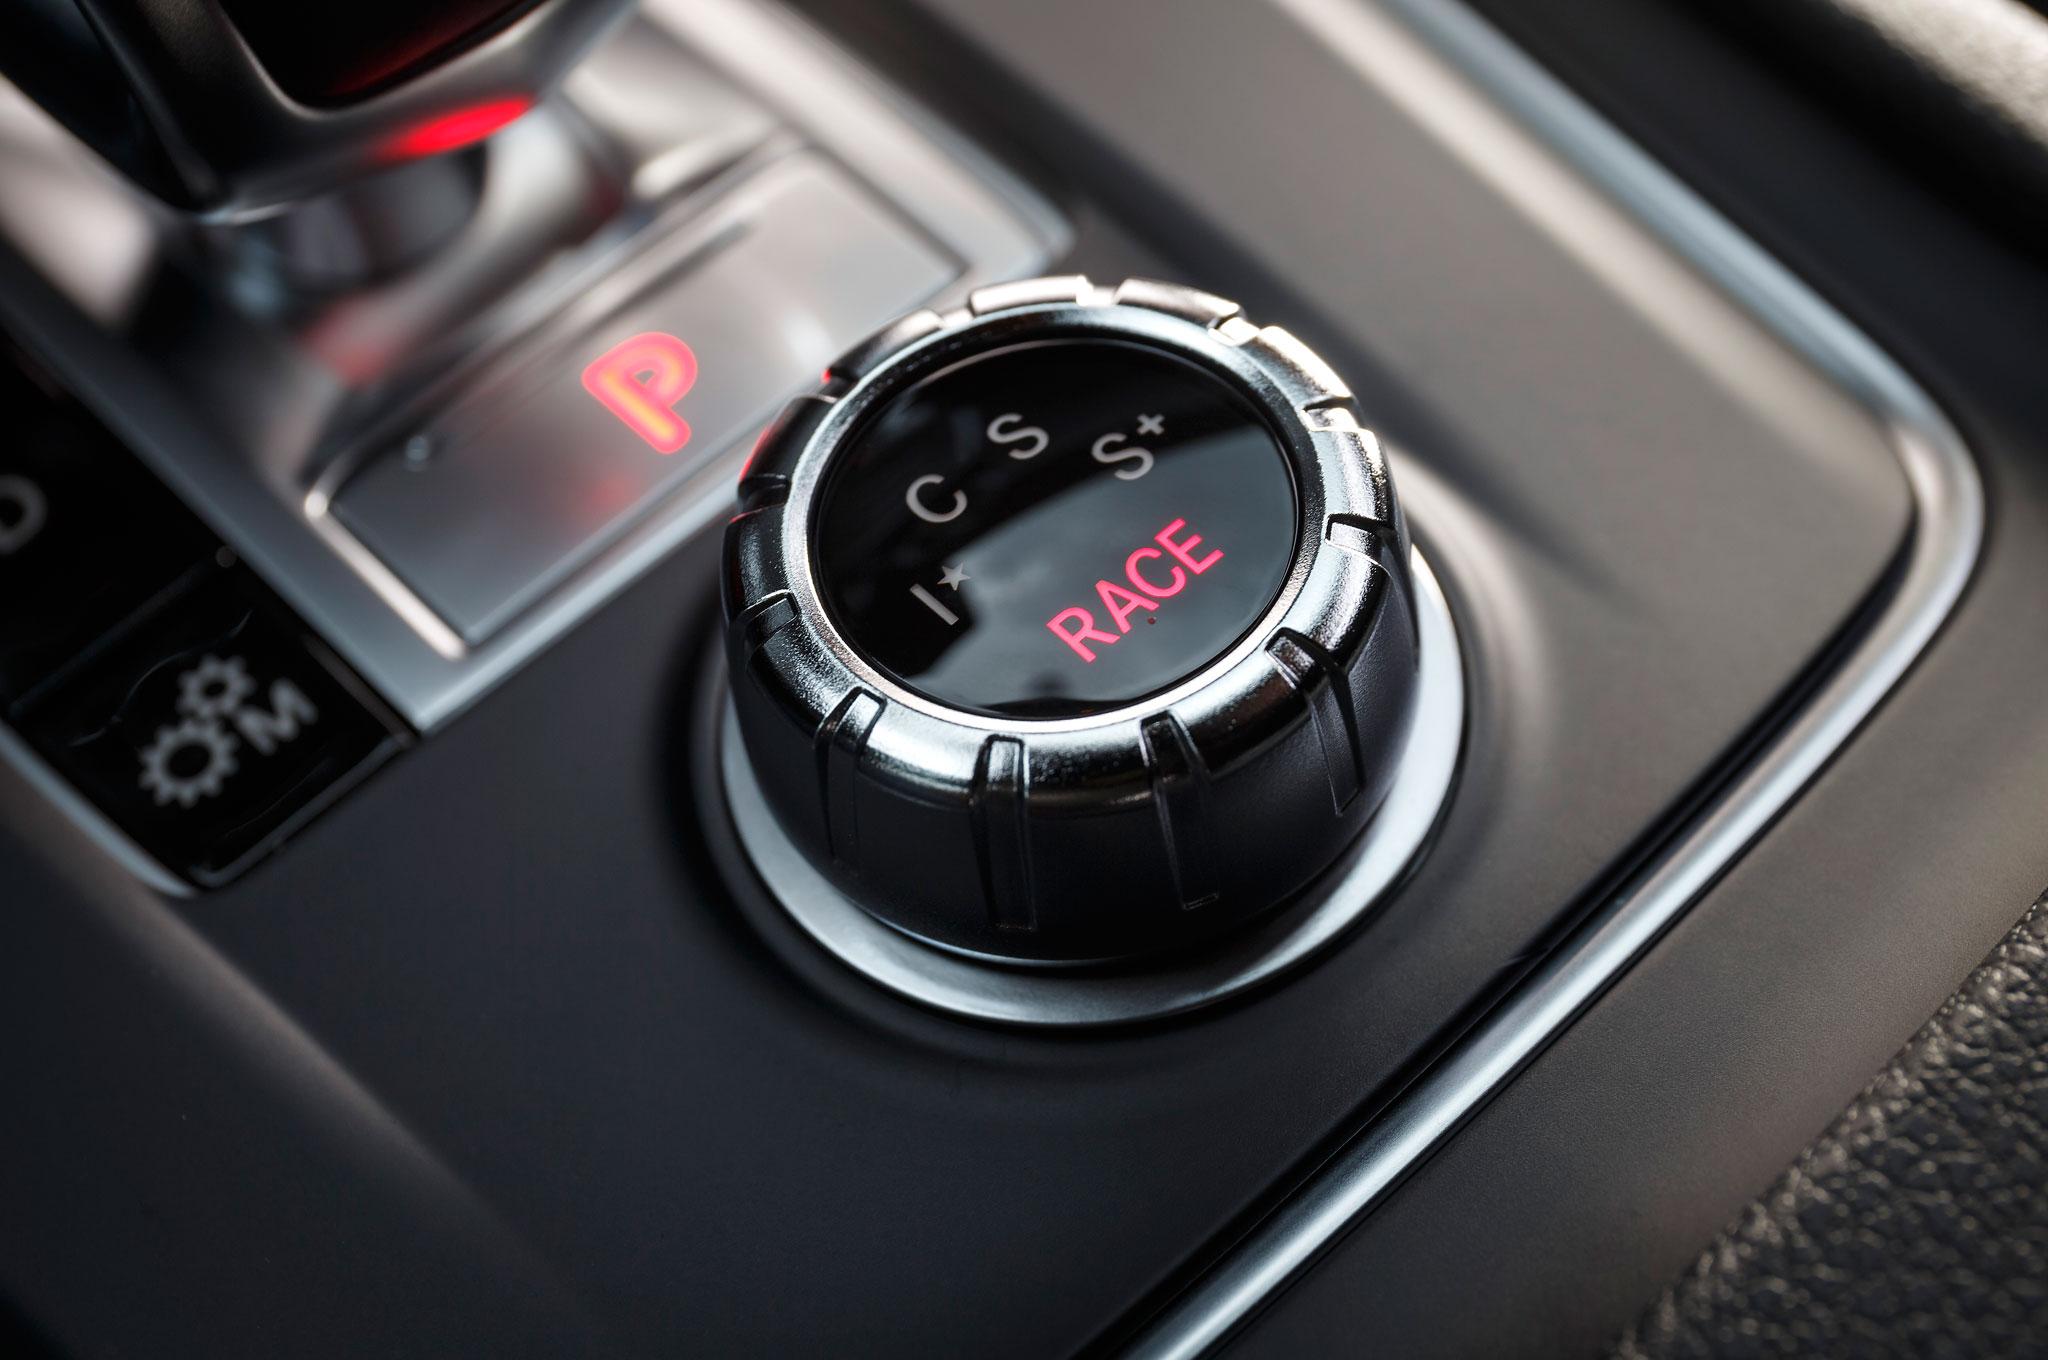 https://st.automobilemag.com/uploads/sites/11/2015/09/2016-Mercedes-AMG-A45-4Matic-selection-knob-01.jpg